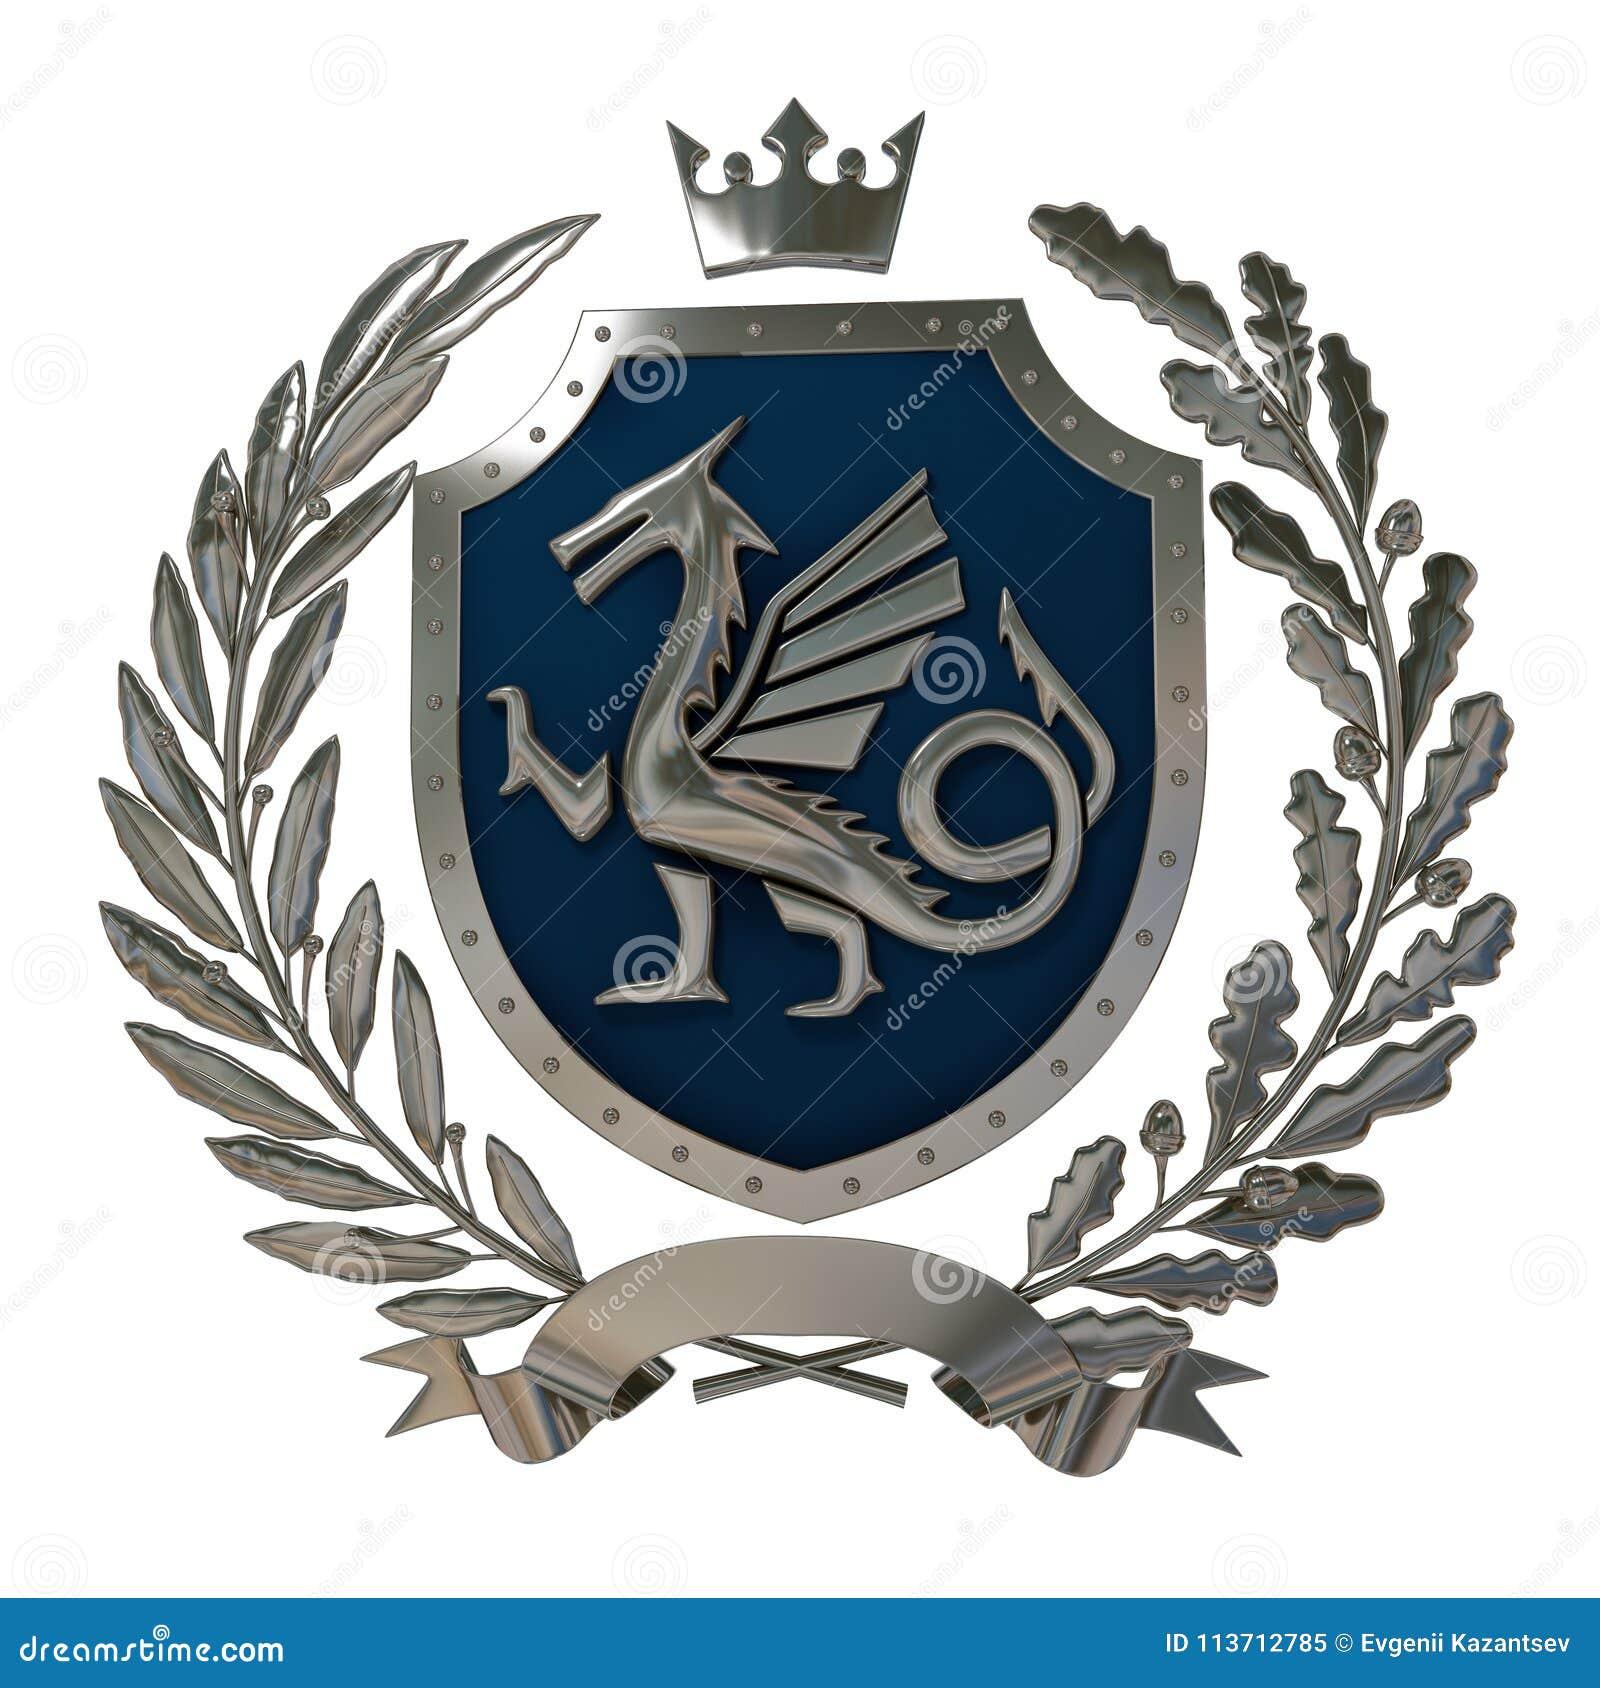 3D例证纹章,蓝色徽章 ÐœÐµÑ 'аД橄榄树枝,橡木分支,冠,盾,龙 Isolat